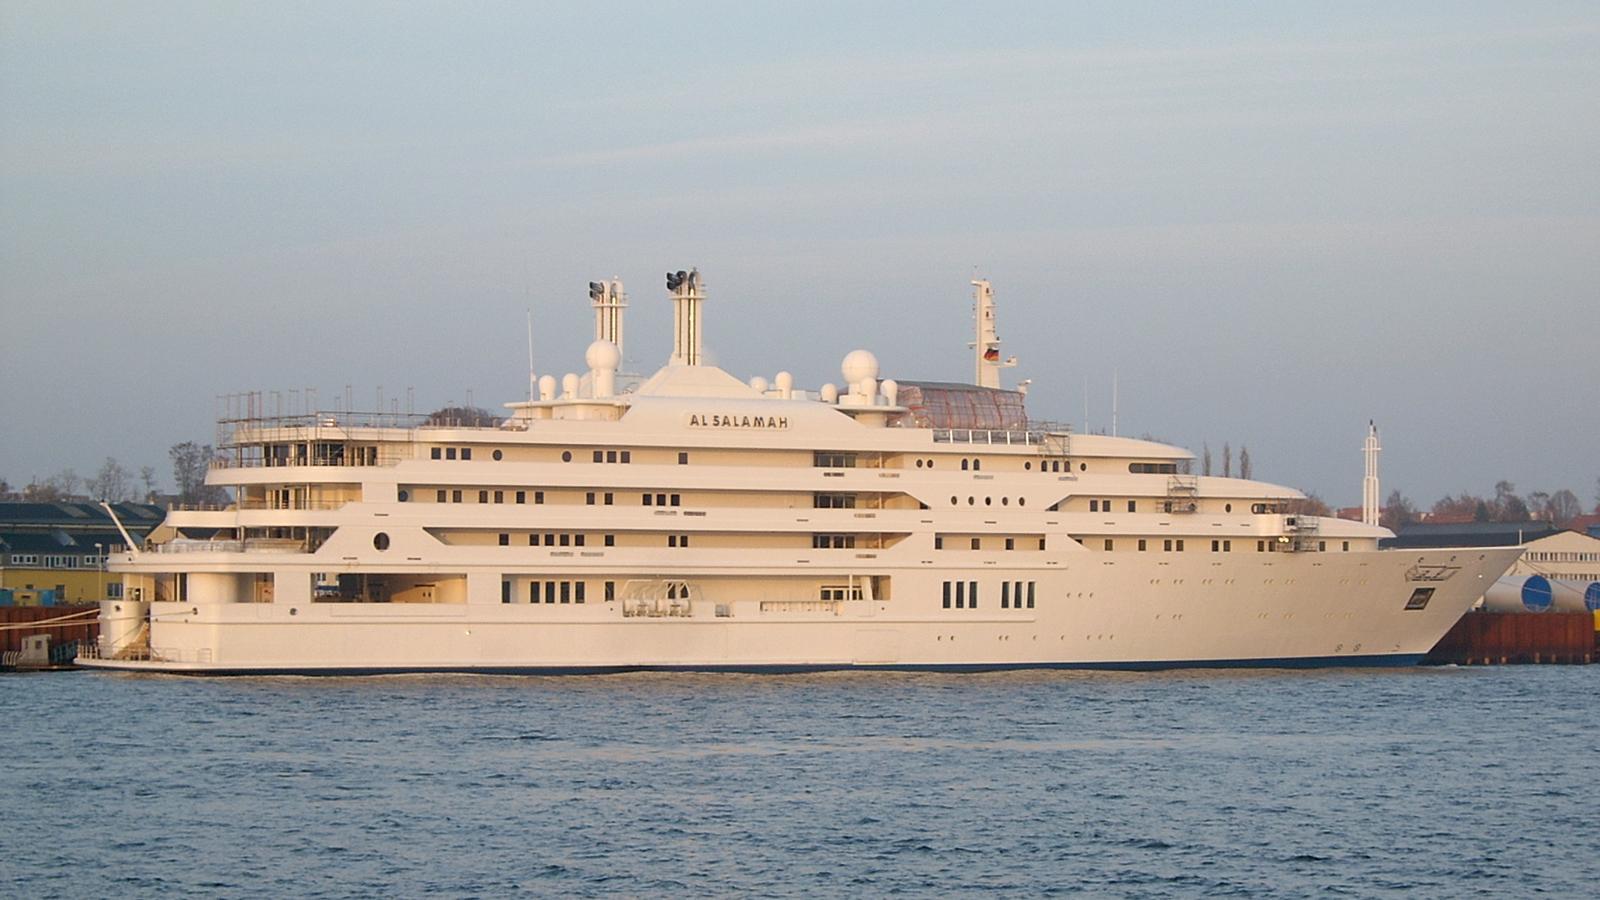 TEWgNJkvRu2WGBxQp4IO_al-salamah-lurssen-yacht-2560x1440.jpg